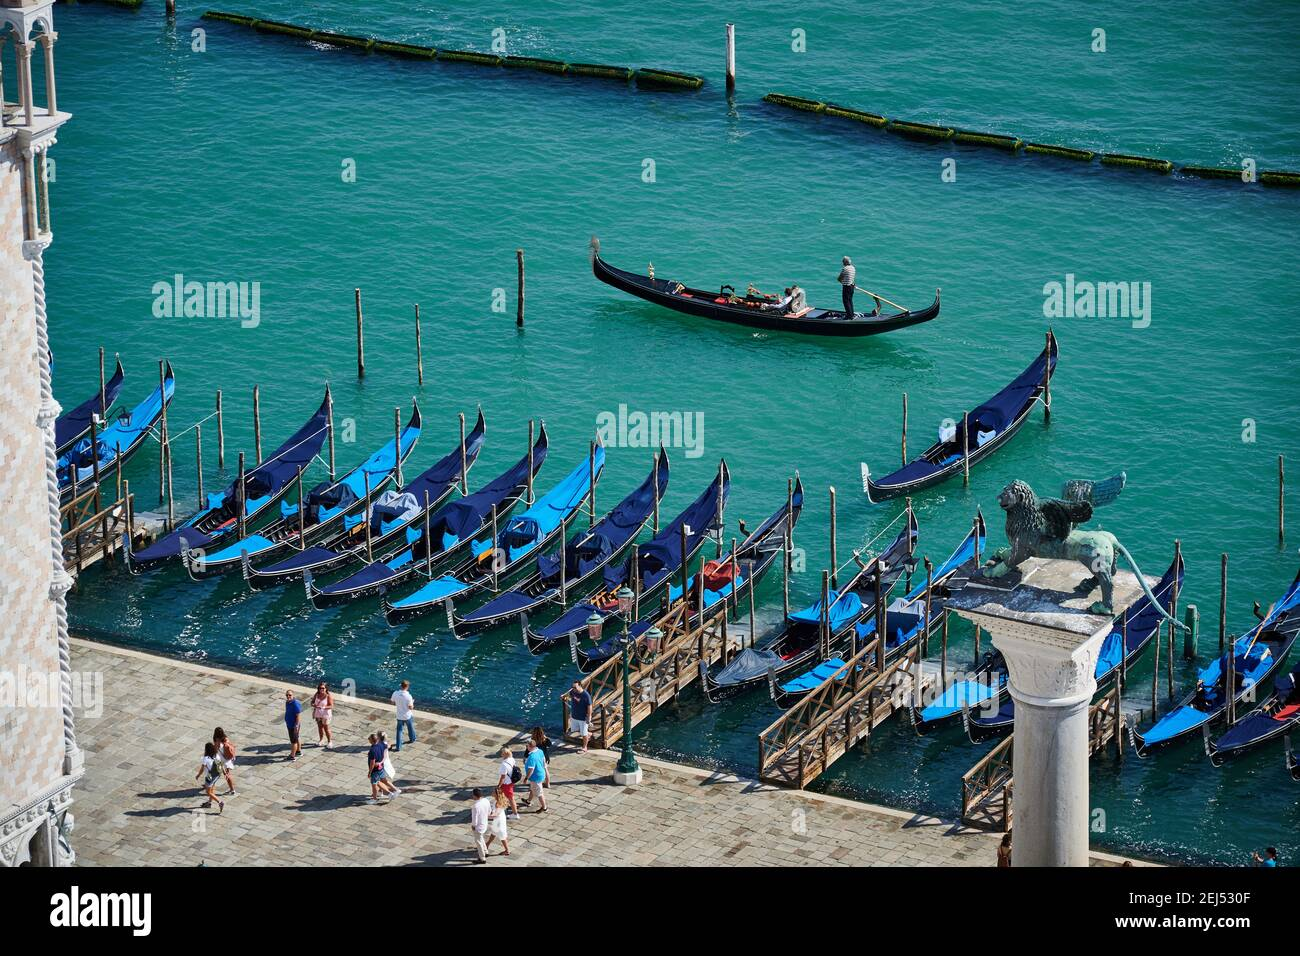 Aerial views from St. Mark's Tower on gondolas in the Venice lagoon, Veneto, Italy Stock Photo